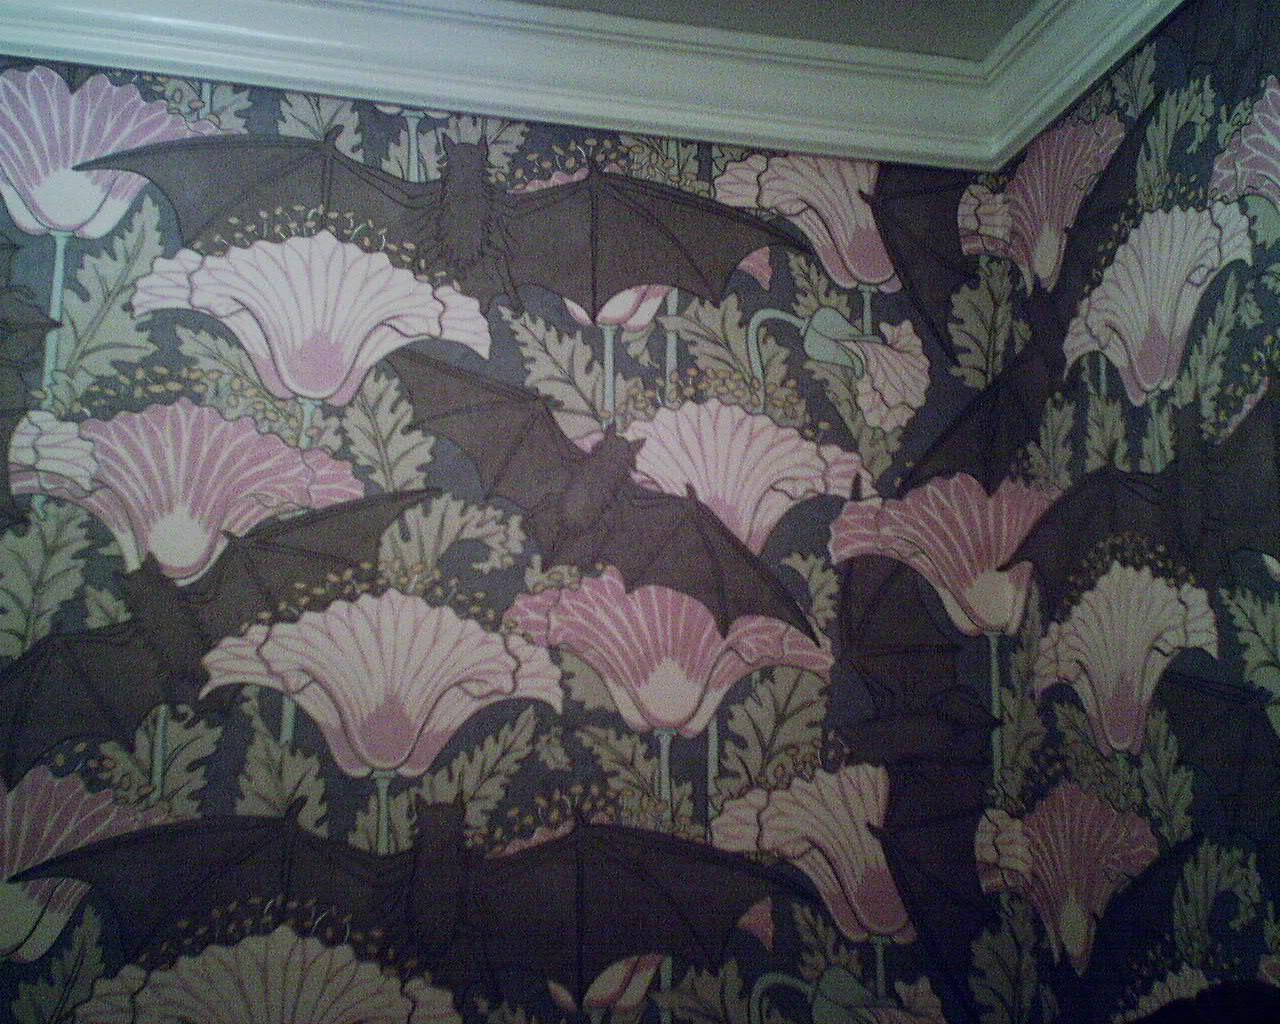 Bat and poppy wallpaperlady 39 s blog - Bat and poppy wallpaper ...